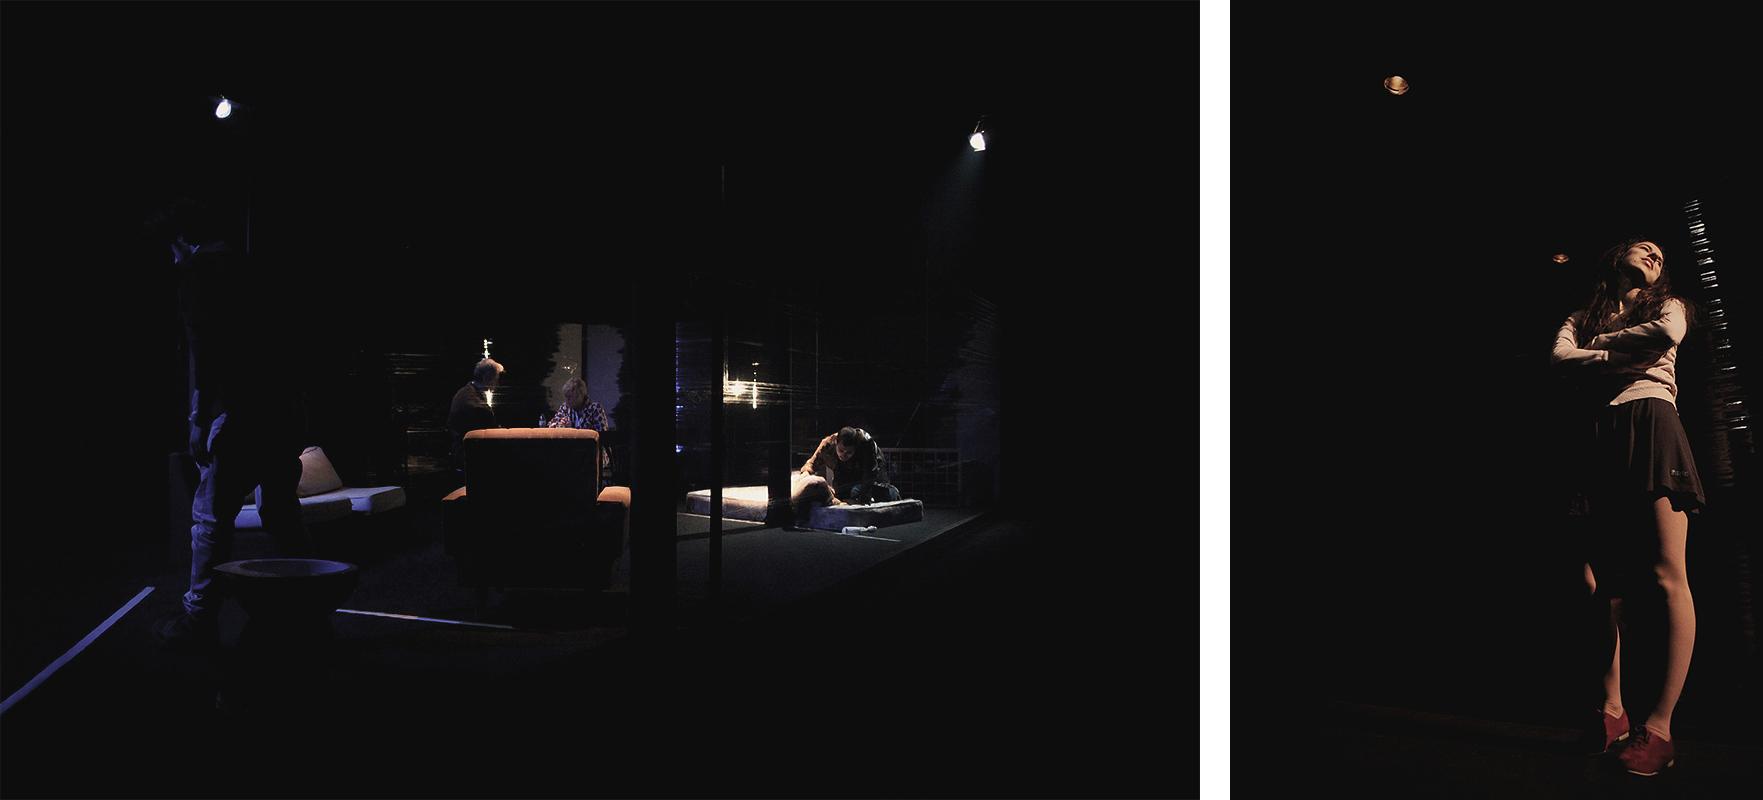 Cara de Fogo TUP Teatro Theatre Ma Companhia Photography Fotografia On Stage bonjourmolotov Andre Gigante 08